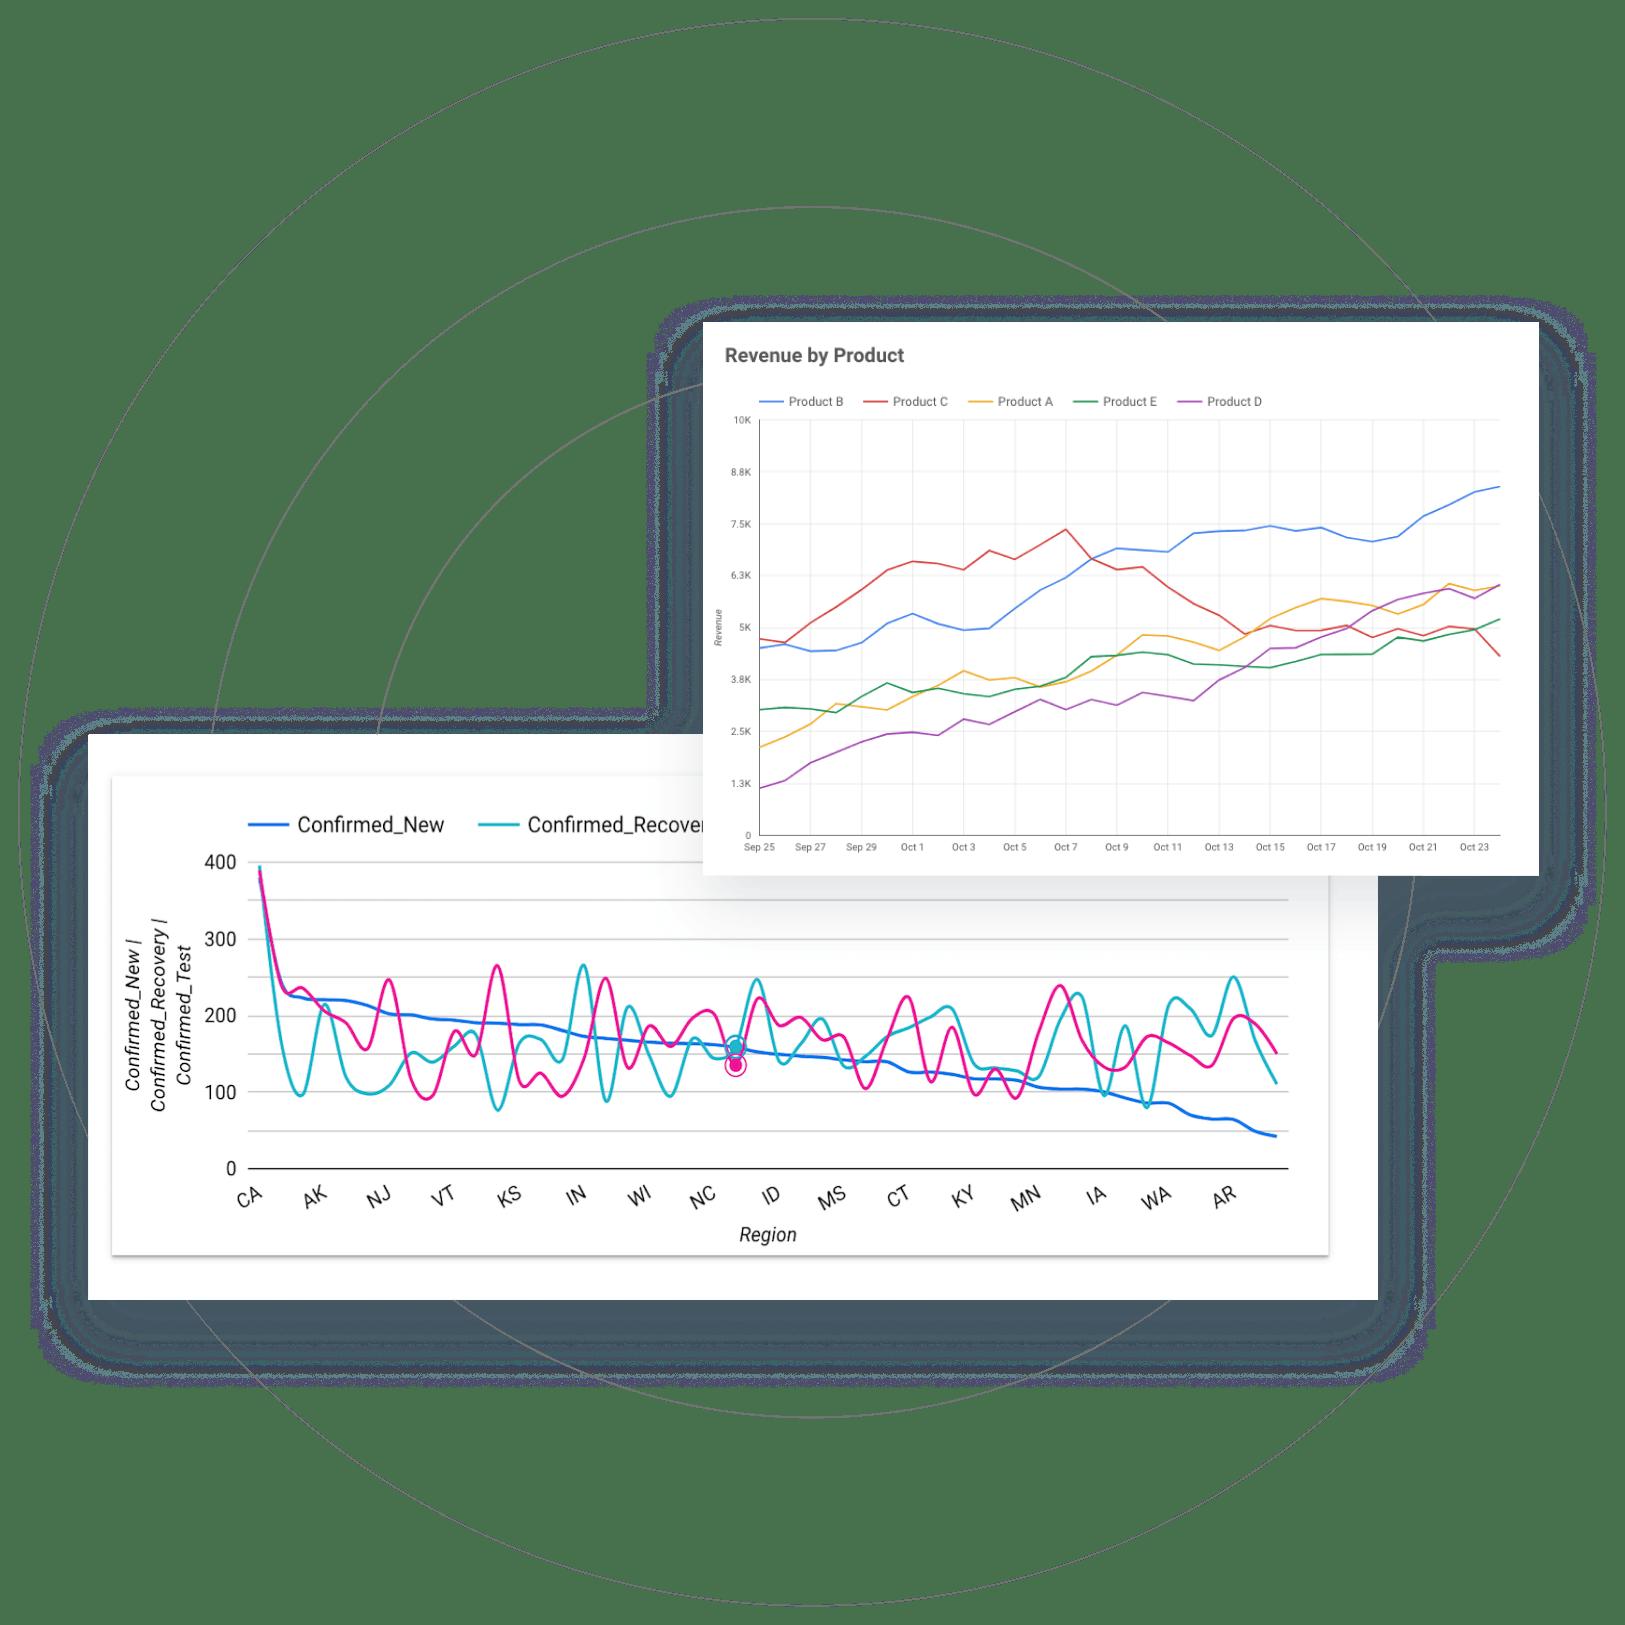 https://darkroom-agency.imgix.net/2021/03/Frame-24.png?auto=compress%2Cformat&ixlib=php-3.3.0